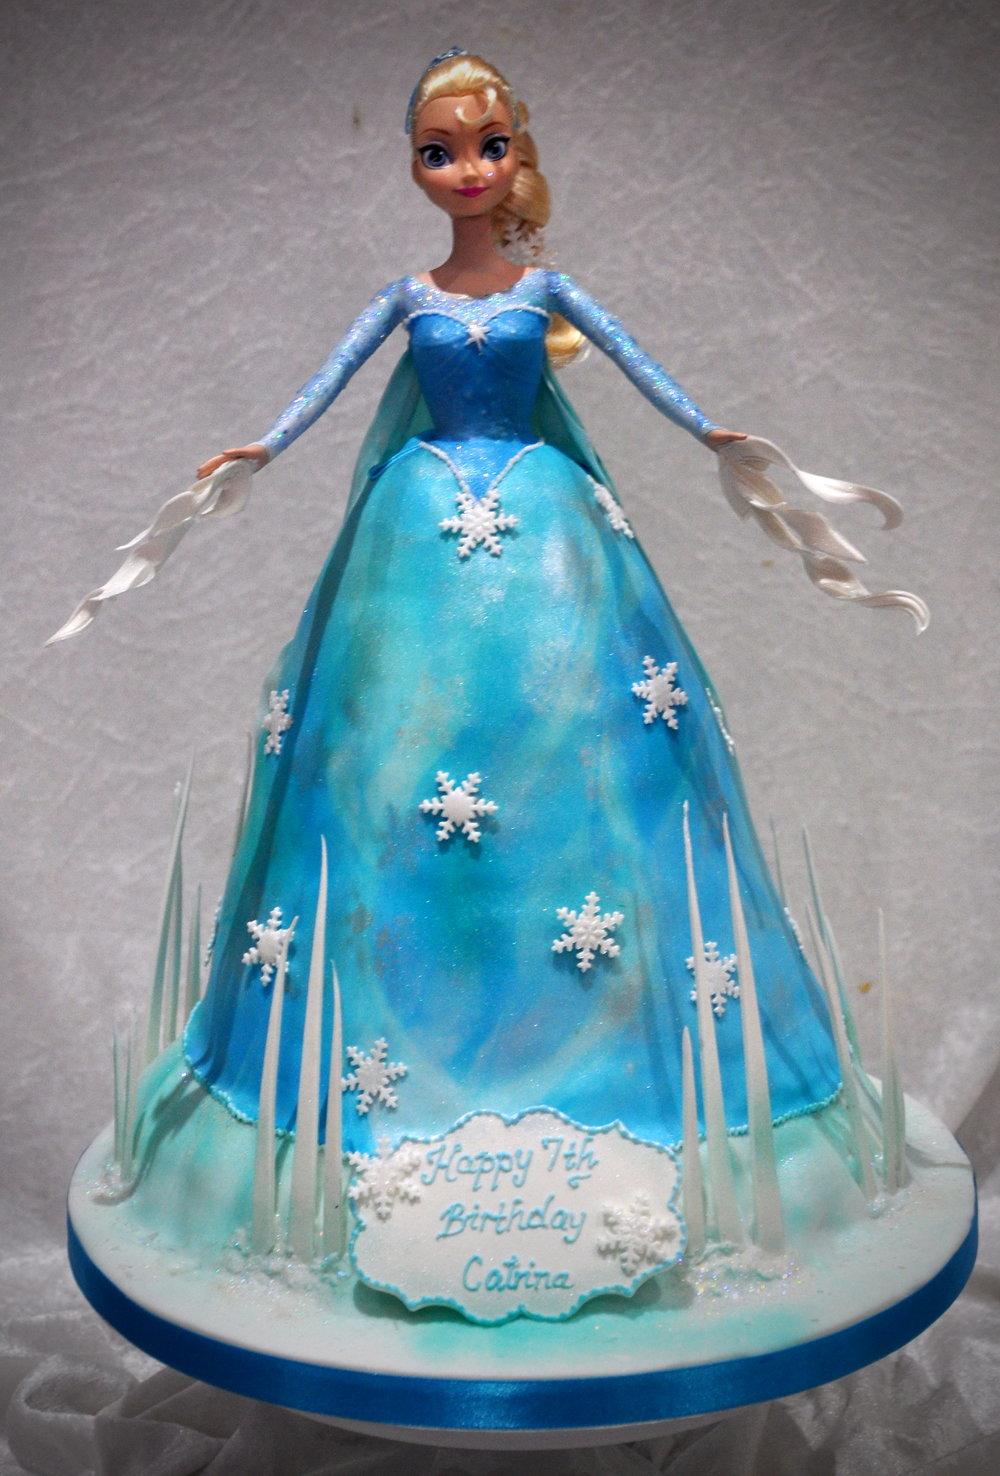 Frozen birthday cake -